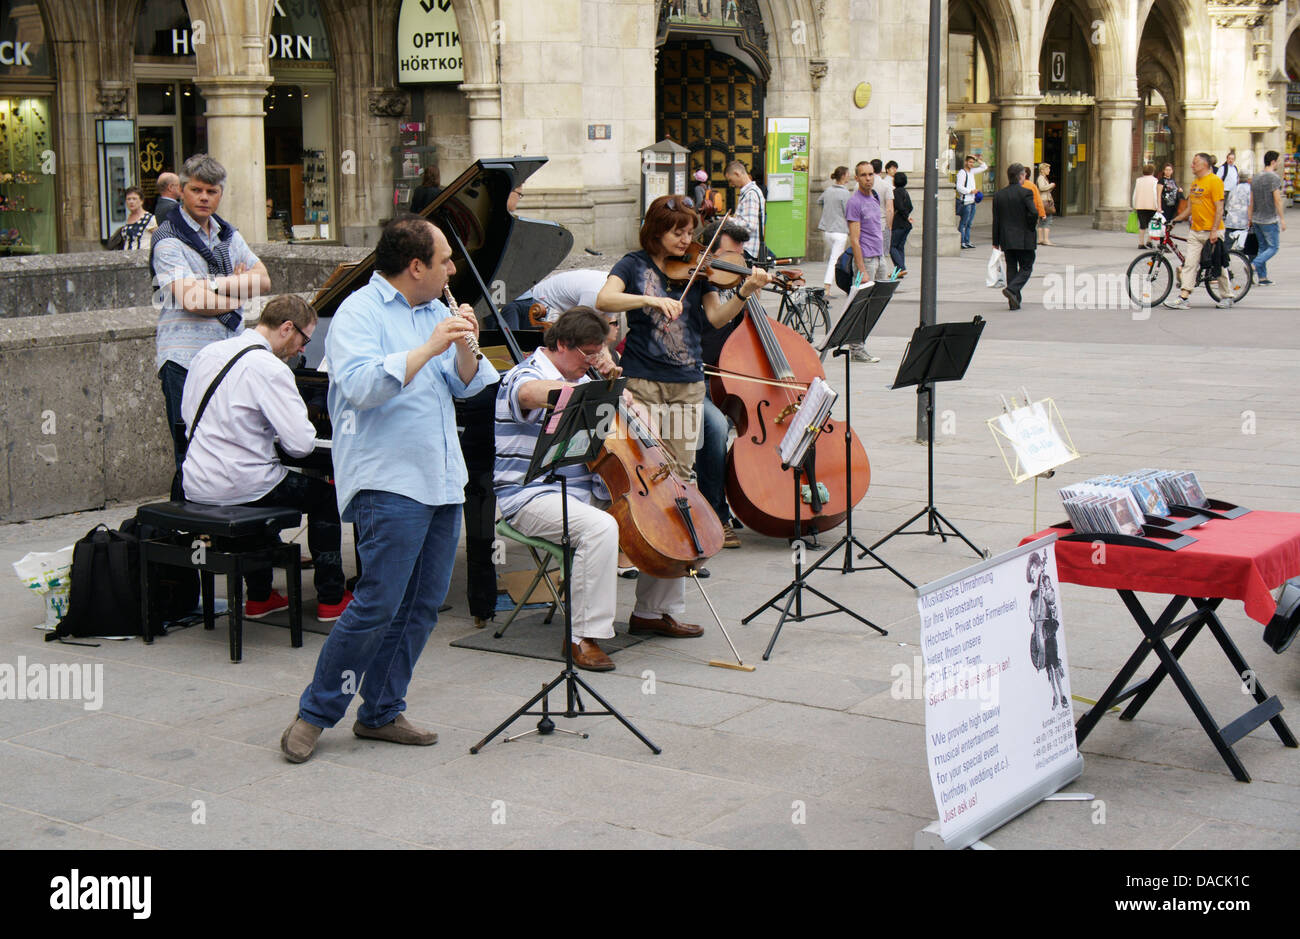 Street musicians on Marienplatz, Munich, Germany - Stock Image